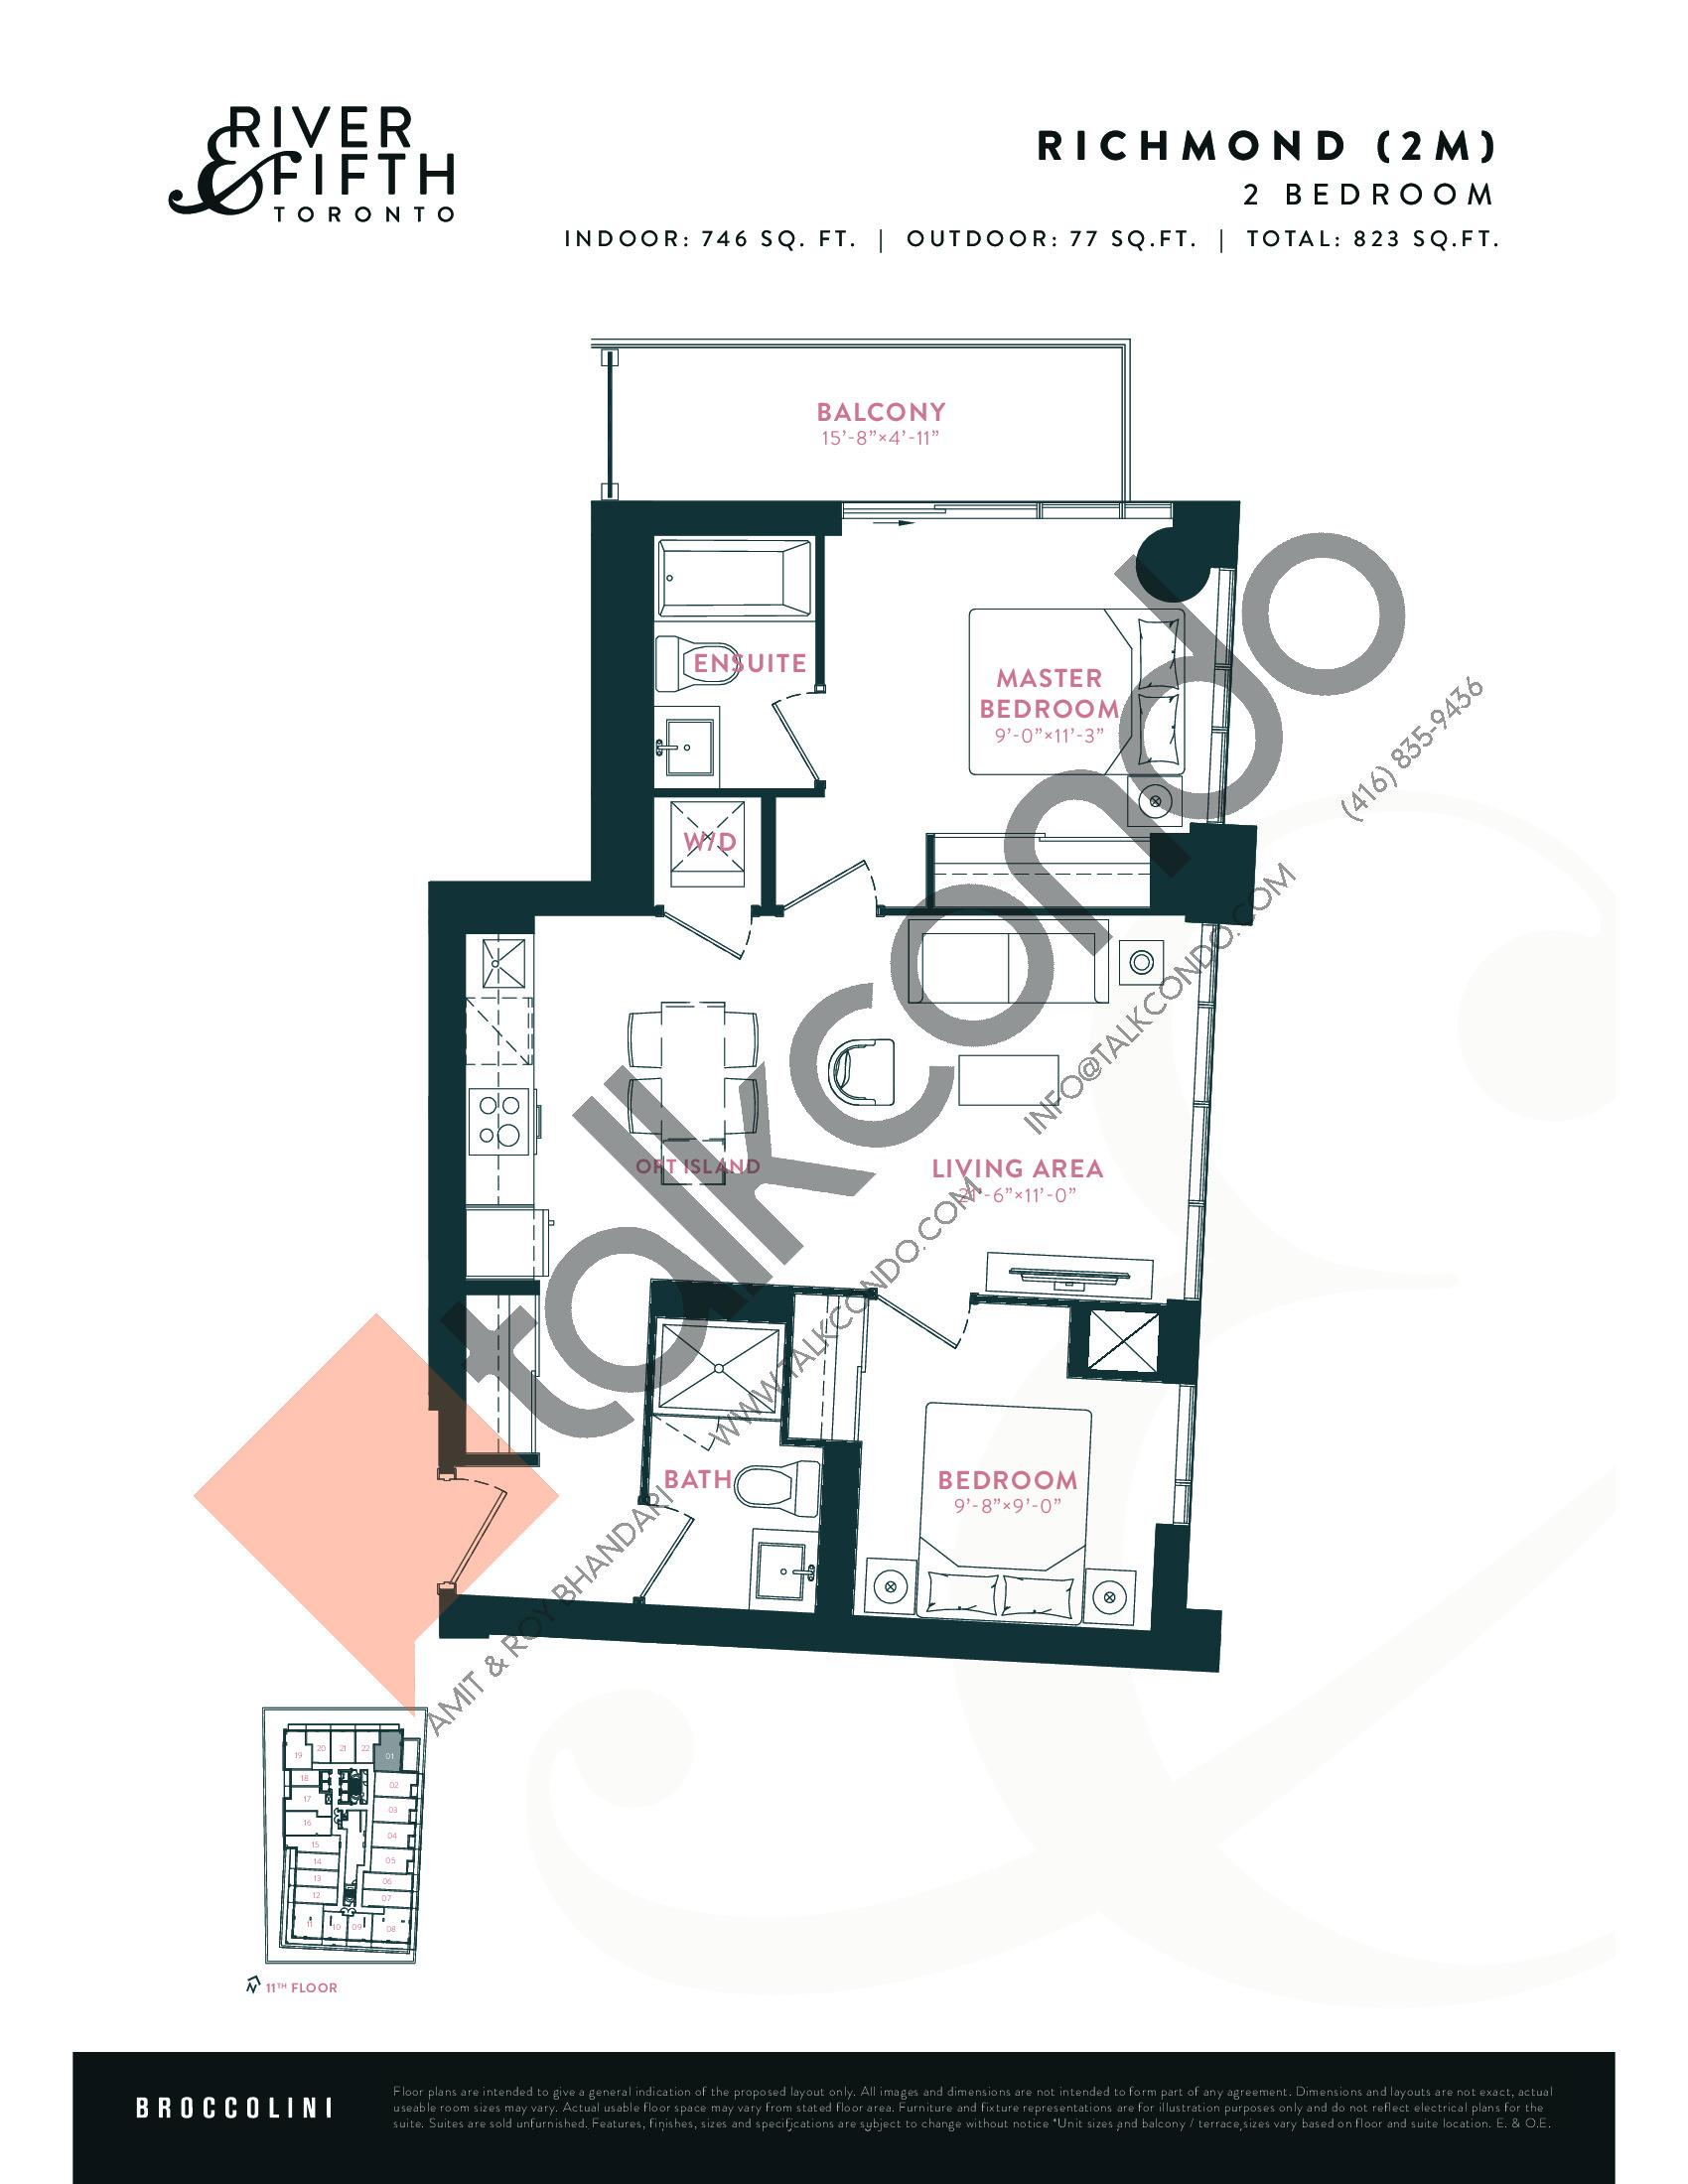 Richmond (2M) Floor Plan at River & Fifth Condos - 746 sq.ft